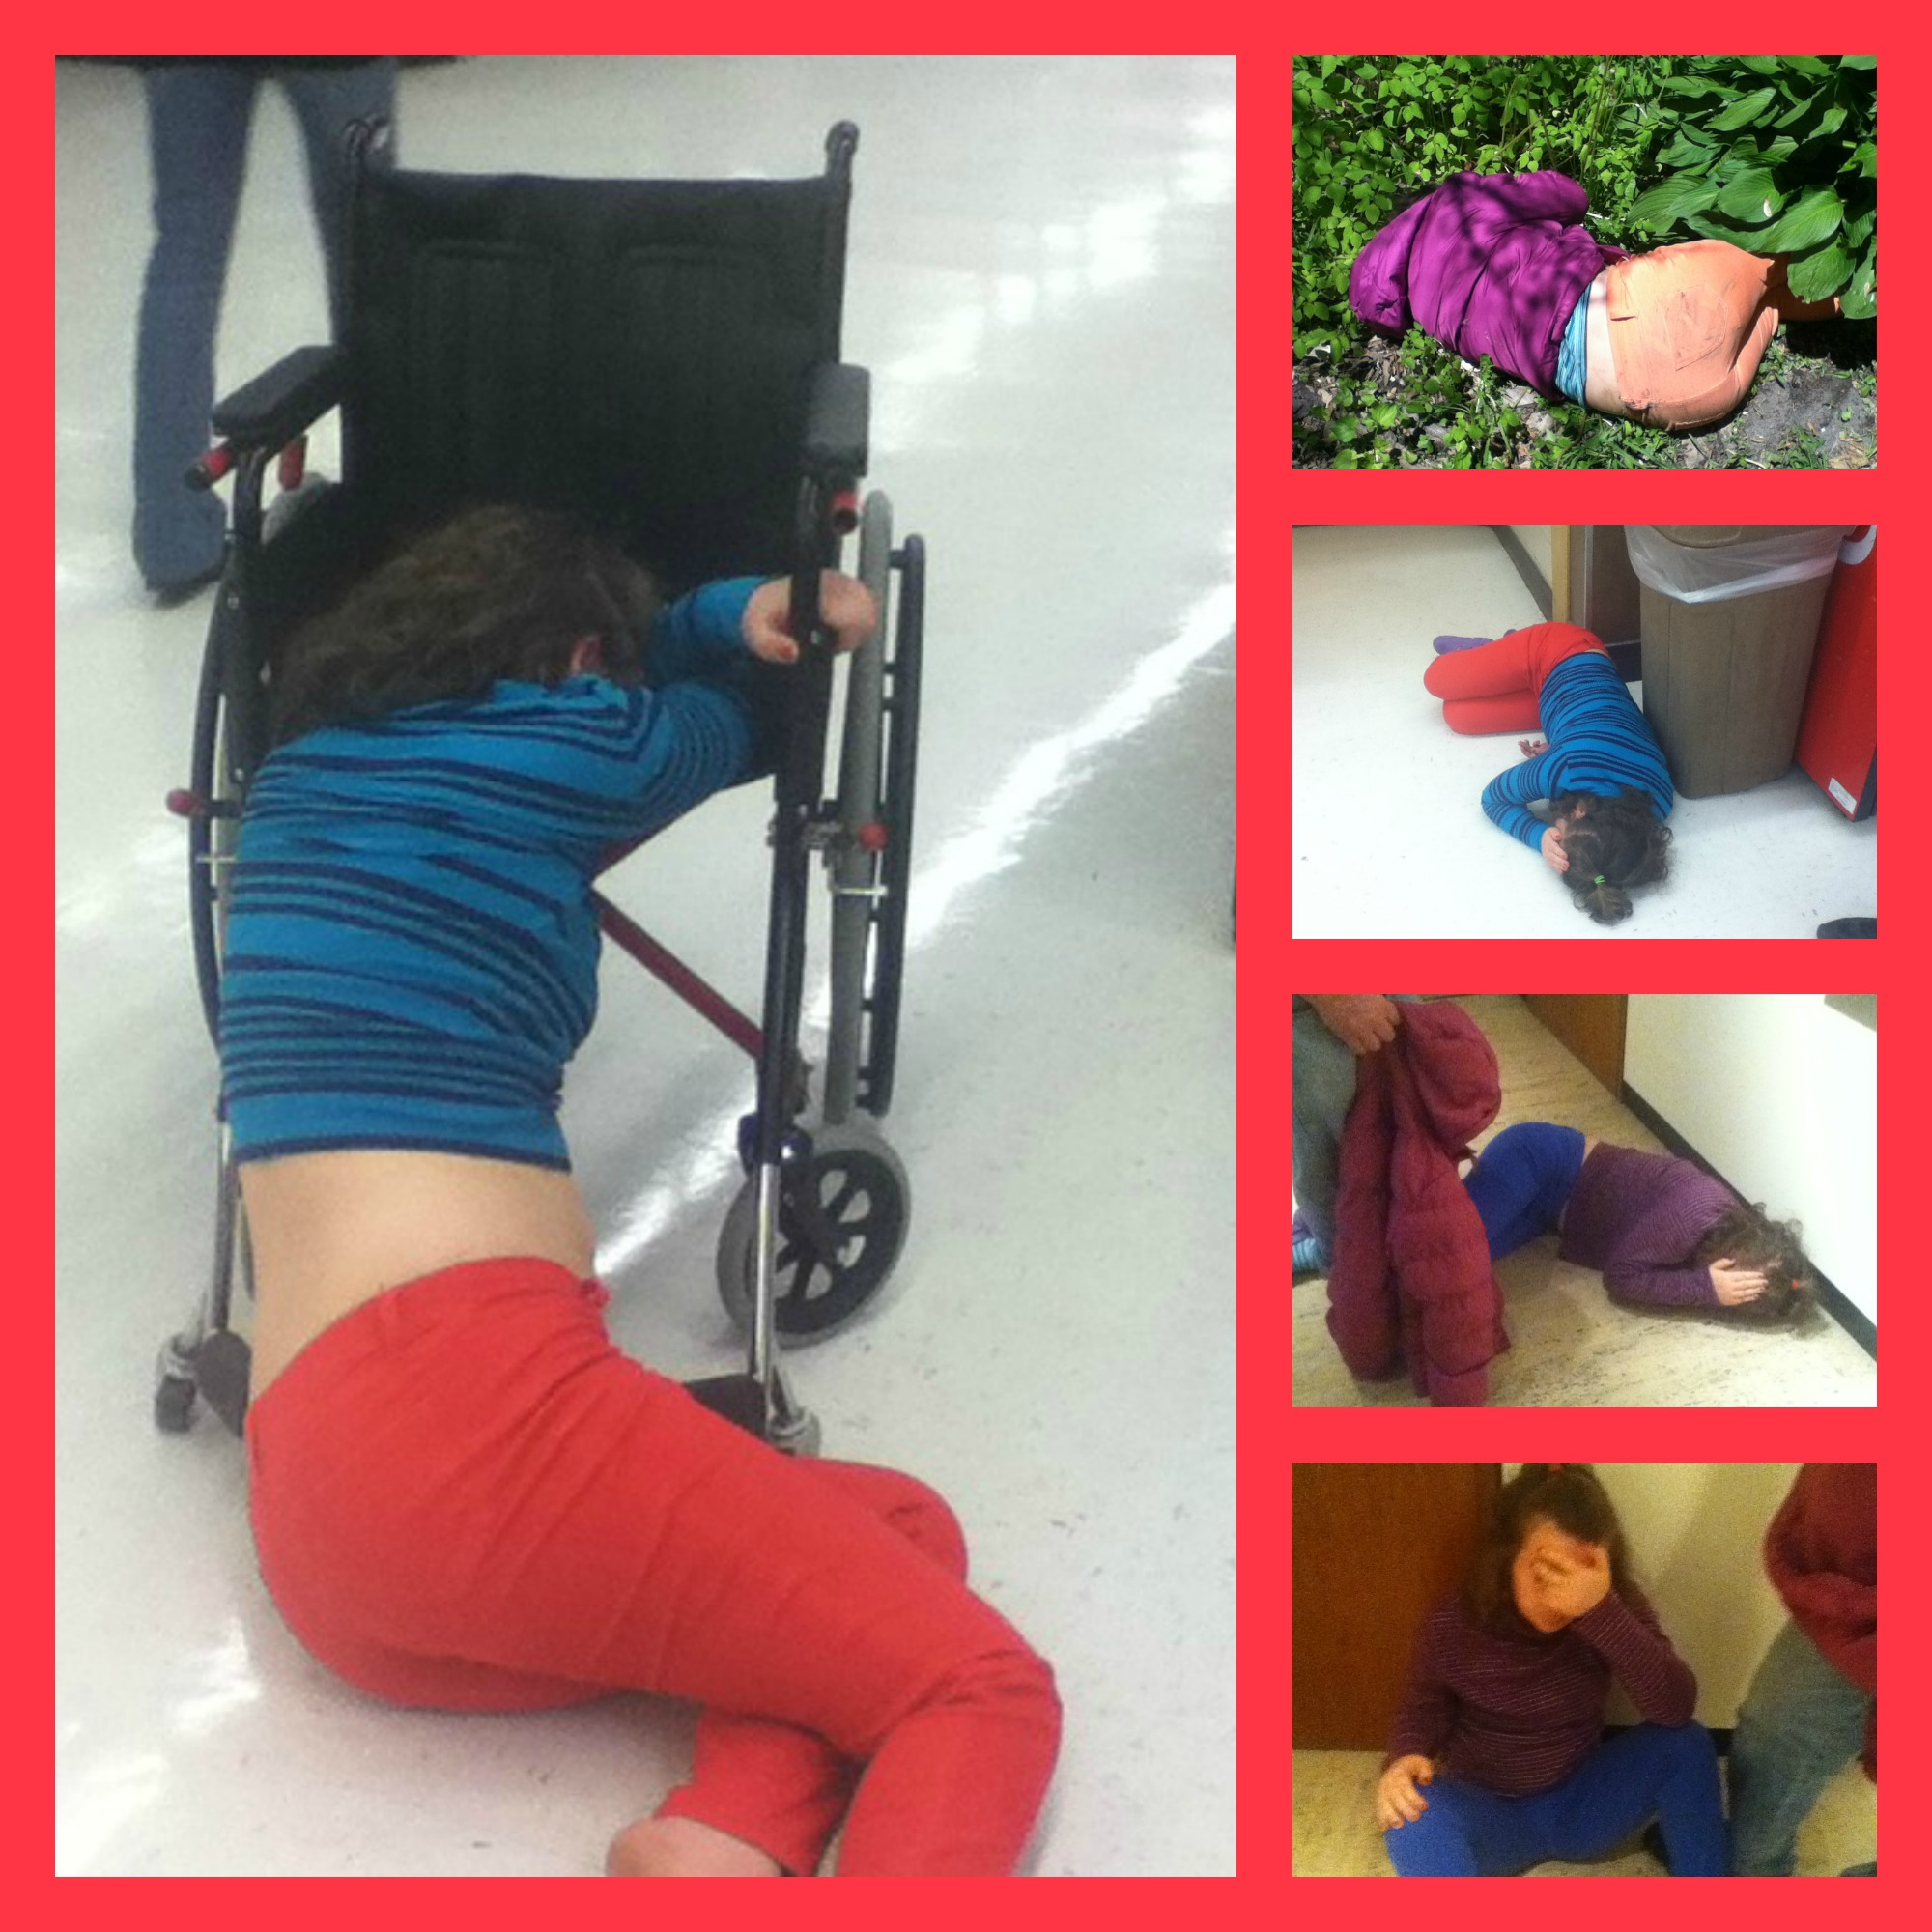 Disciplining Children With Special Needs